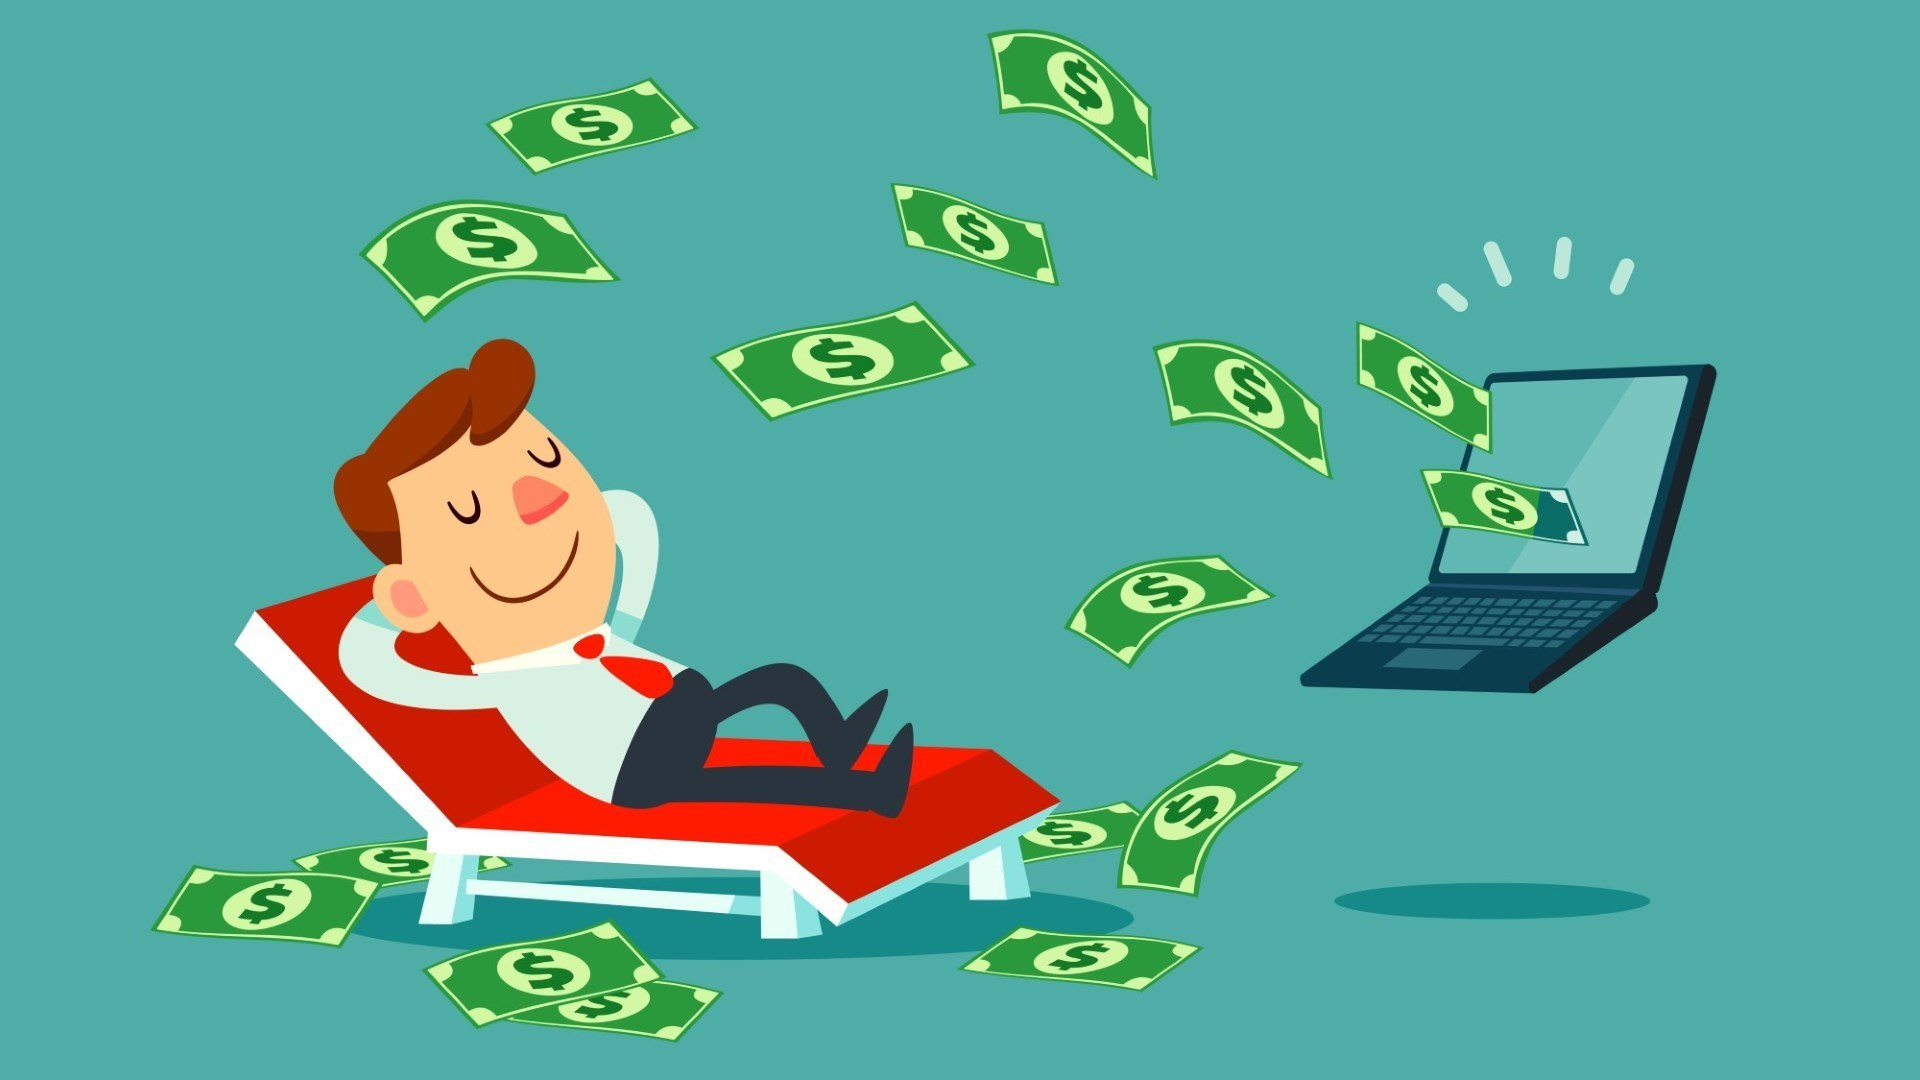 jövedelem az interneten passzív jövedelem